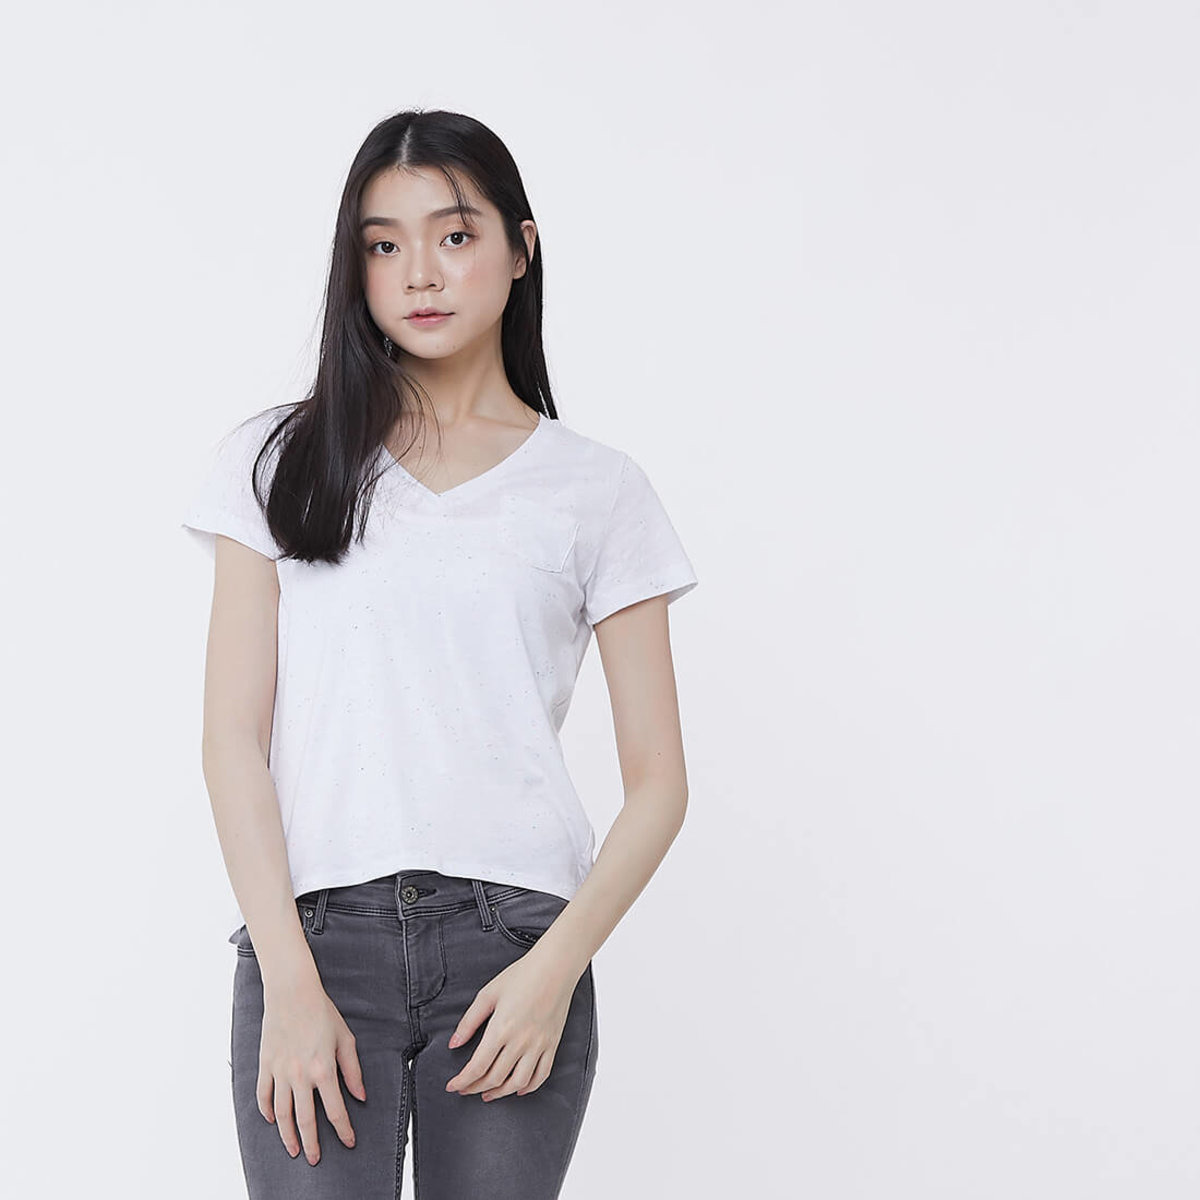 Nap Dots Cotton Fabric V-neck Swallowtail T-shirt Top White